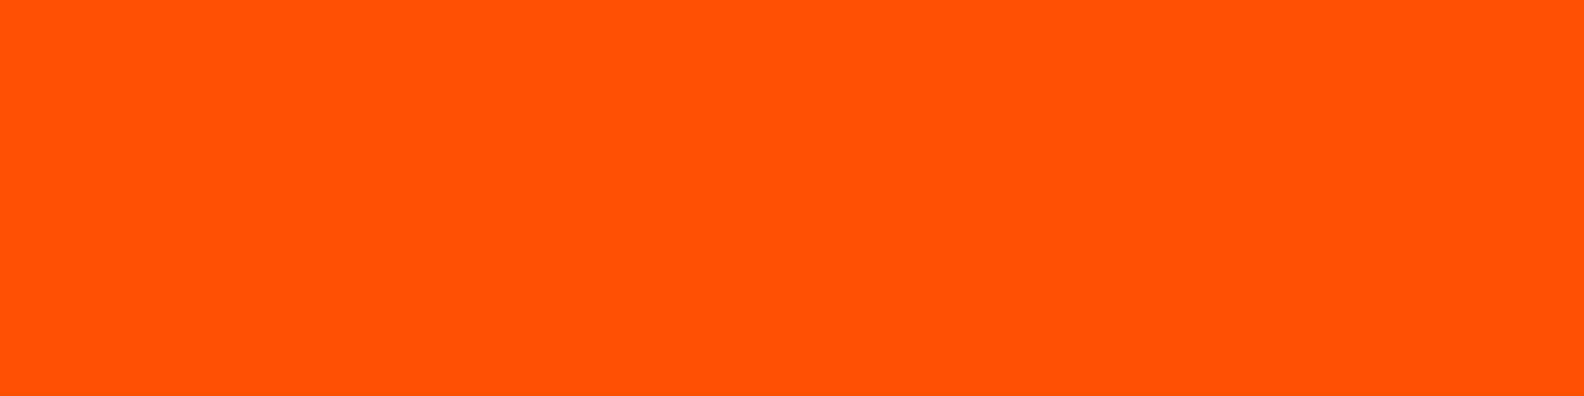 1584x396 International Orange Aerospace Solid Color Background